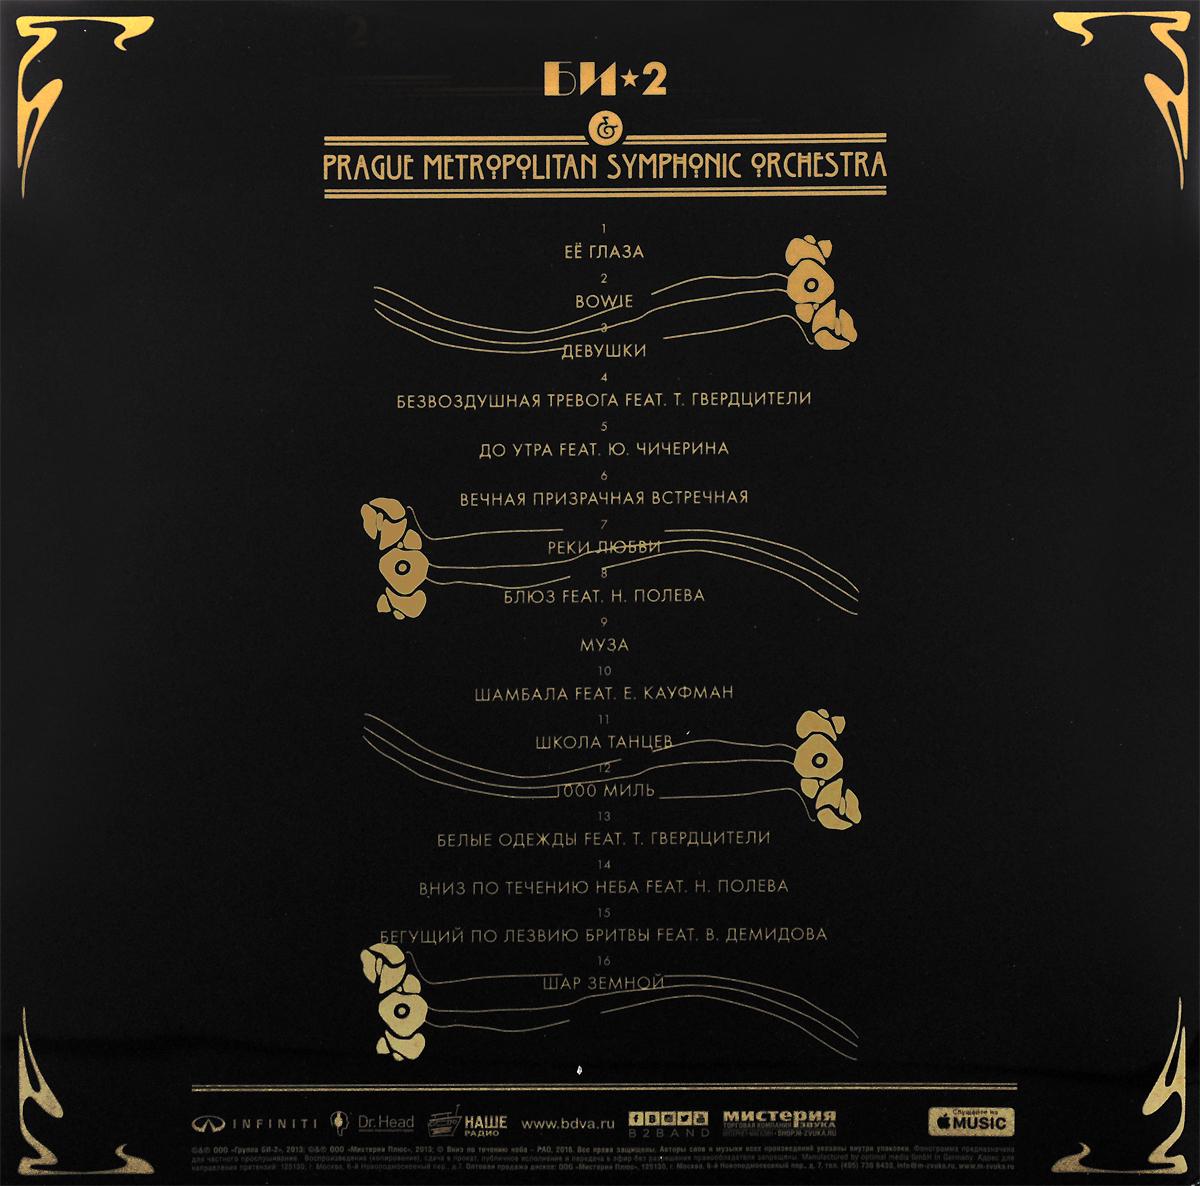 Би-2.  Prague Metropolitan Symphonic Orchestra (2 LP)